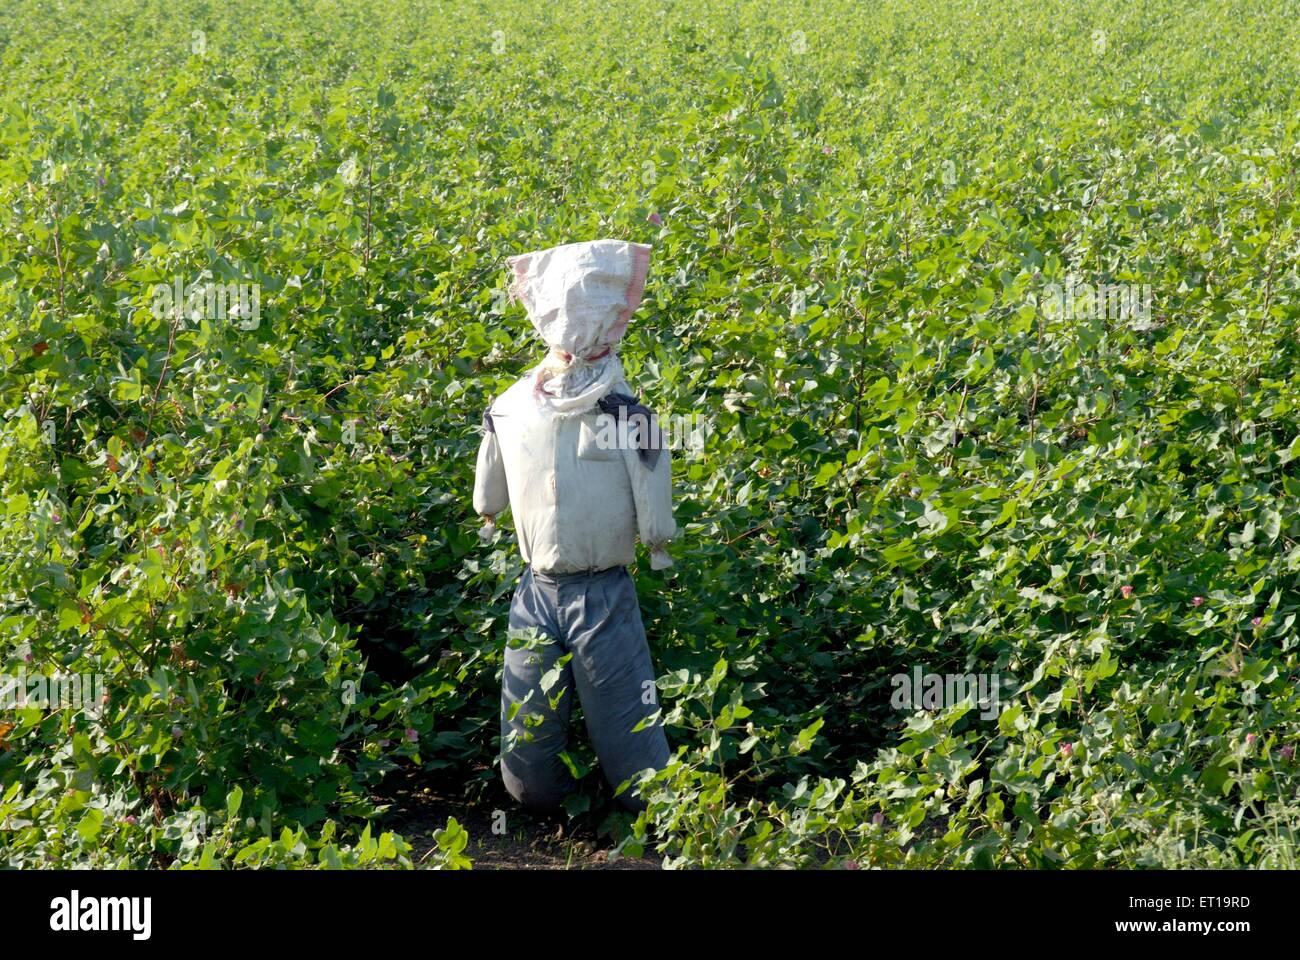 Scarecrow in cotton plant field ; Amreli ; Gujarat ; India - Stock Image